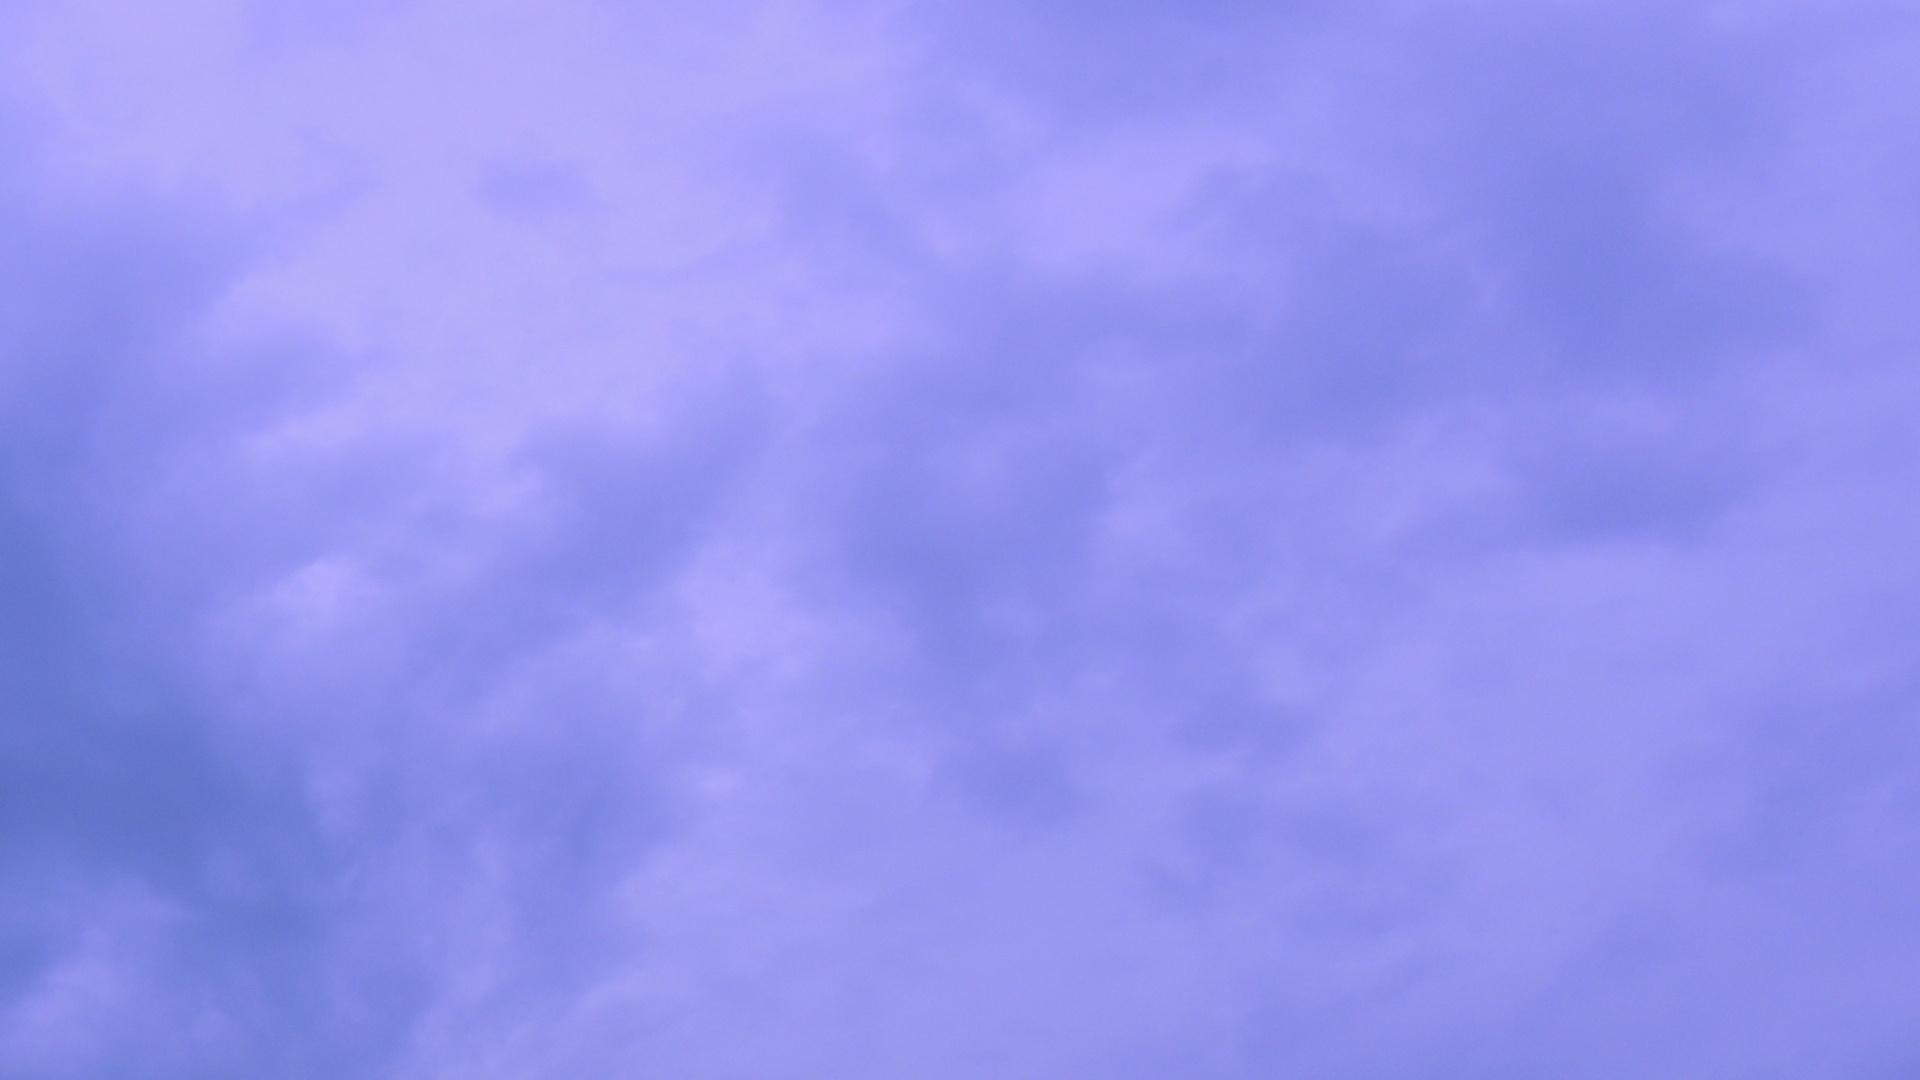 Pastel Clouds Free Stock Photo  Public Domain Pictures